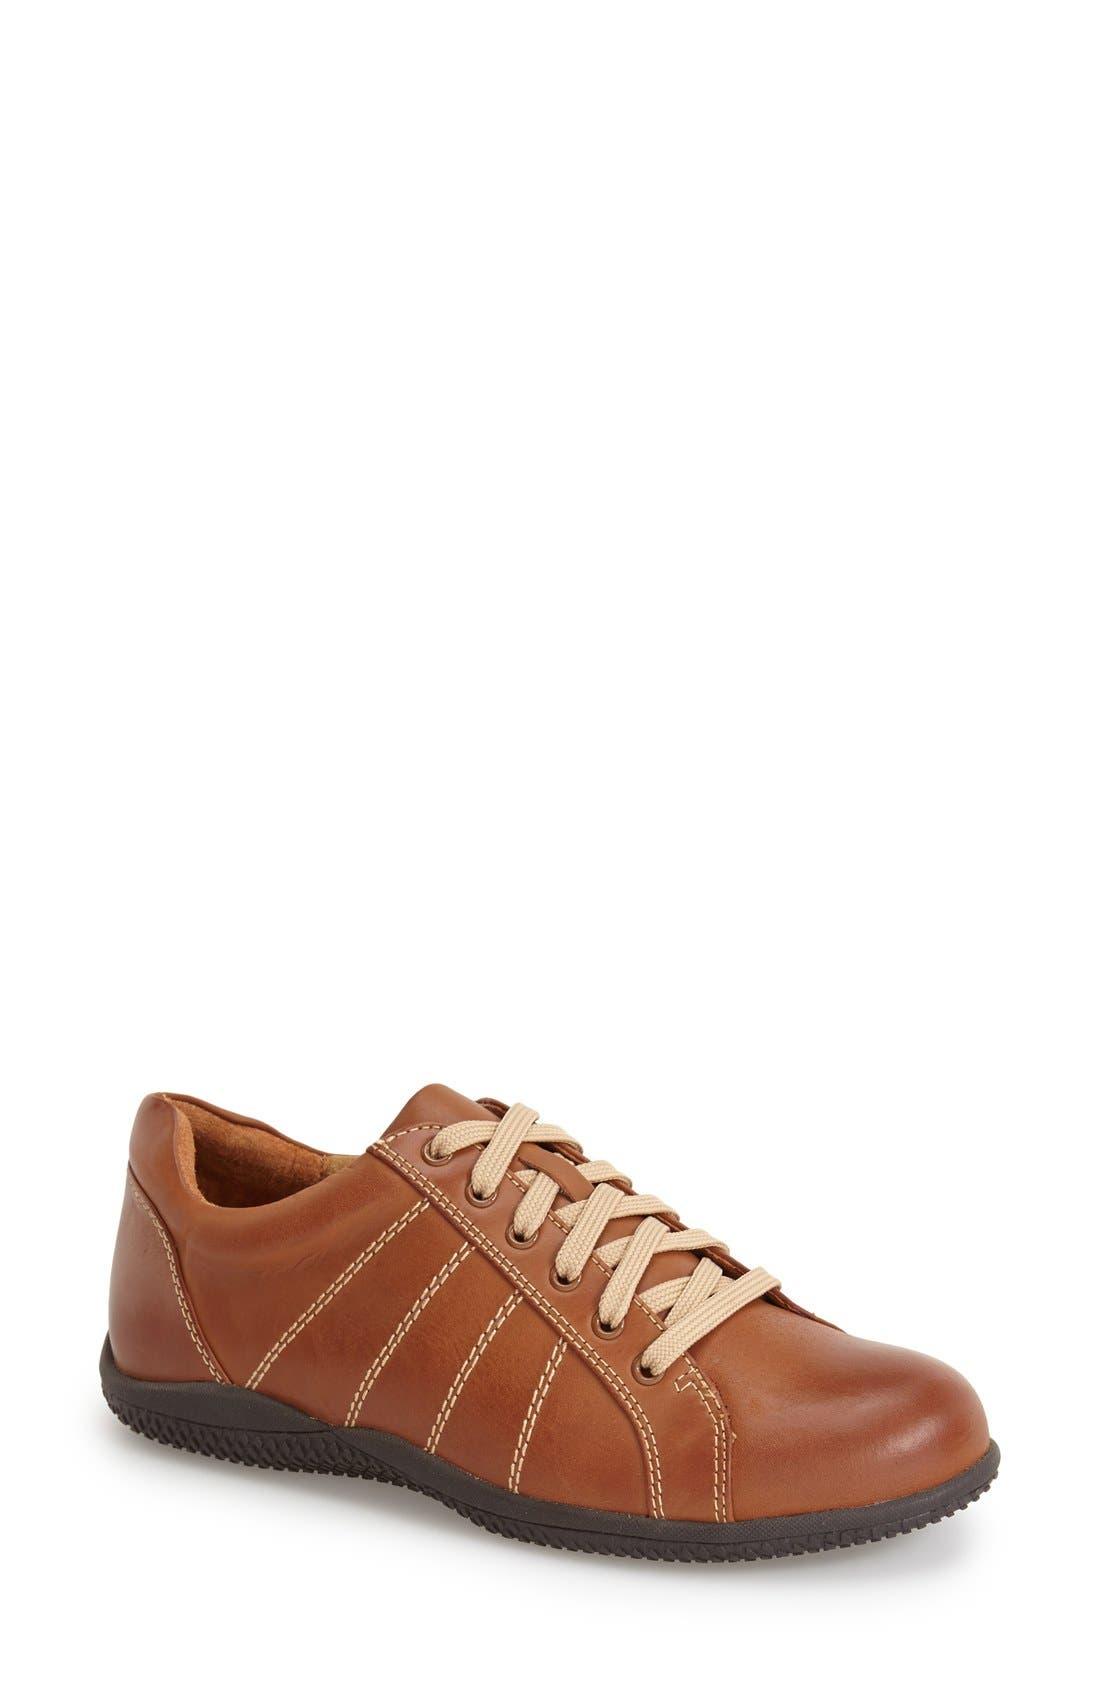 Alternate Image 1 Selected - SoftWalk® 'Hickory' Sneaker (Women)